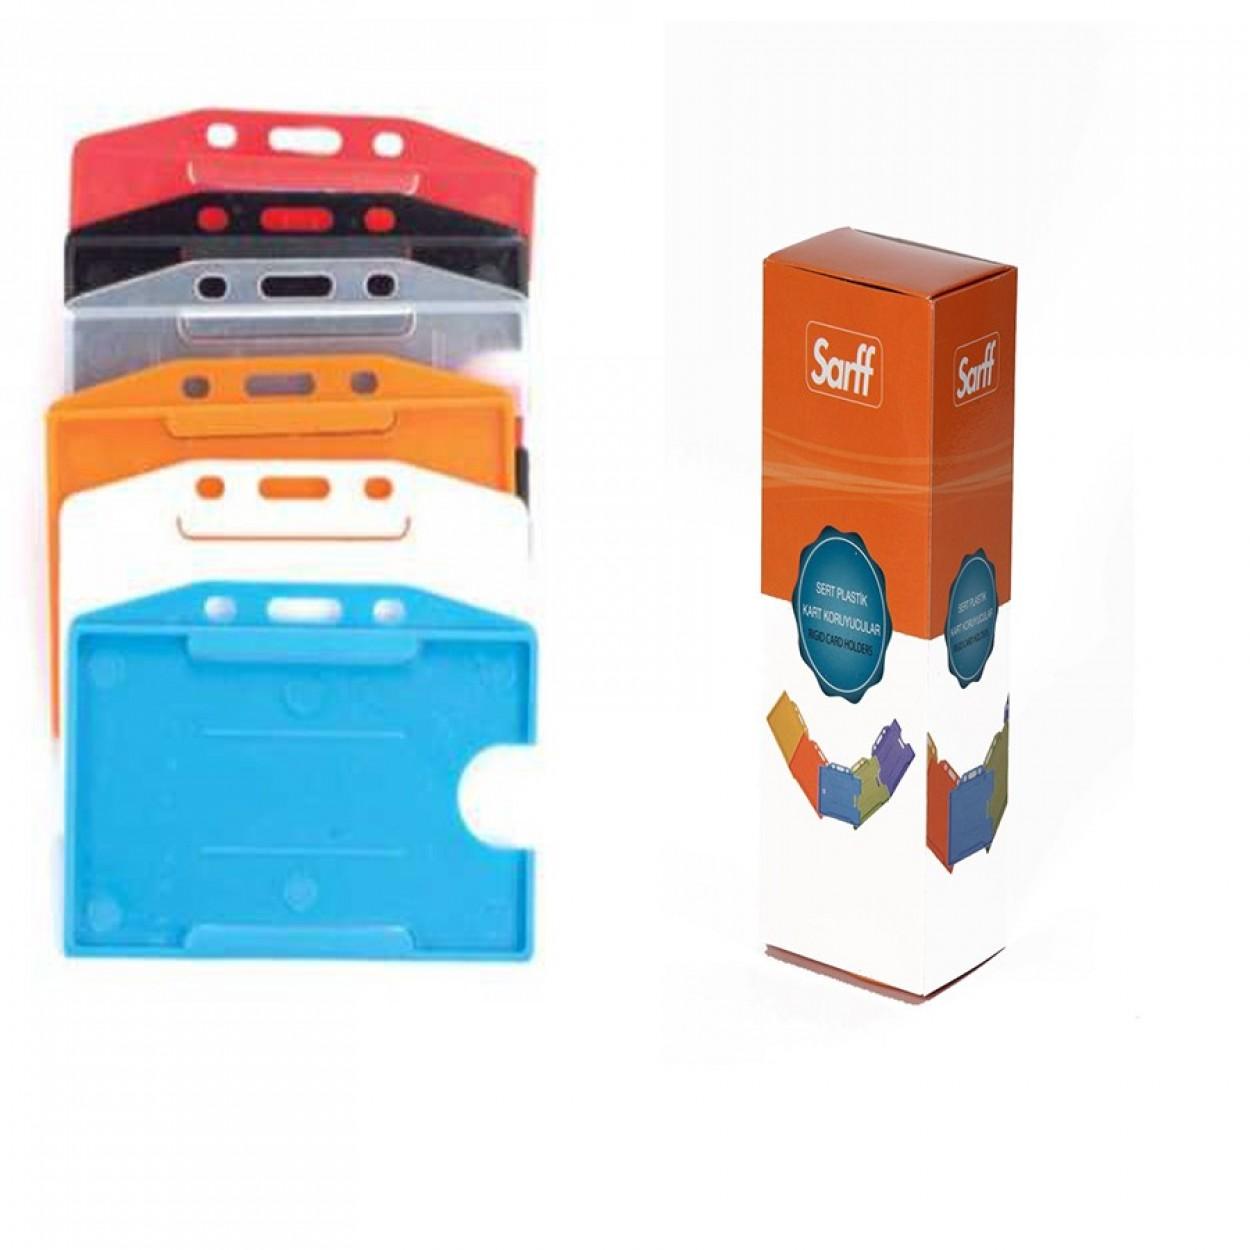 Sarff Sert Plastik Kart Muhafaza Yatay 50 Li Kırmızı